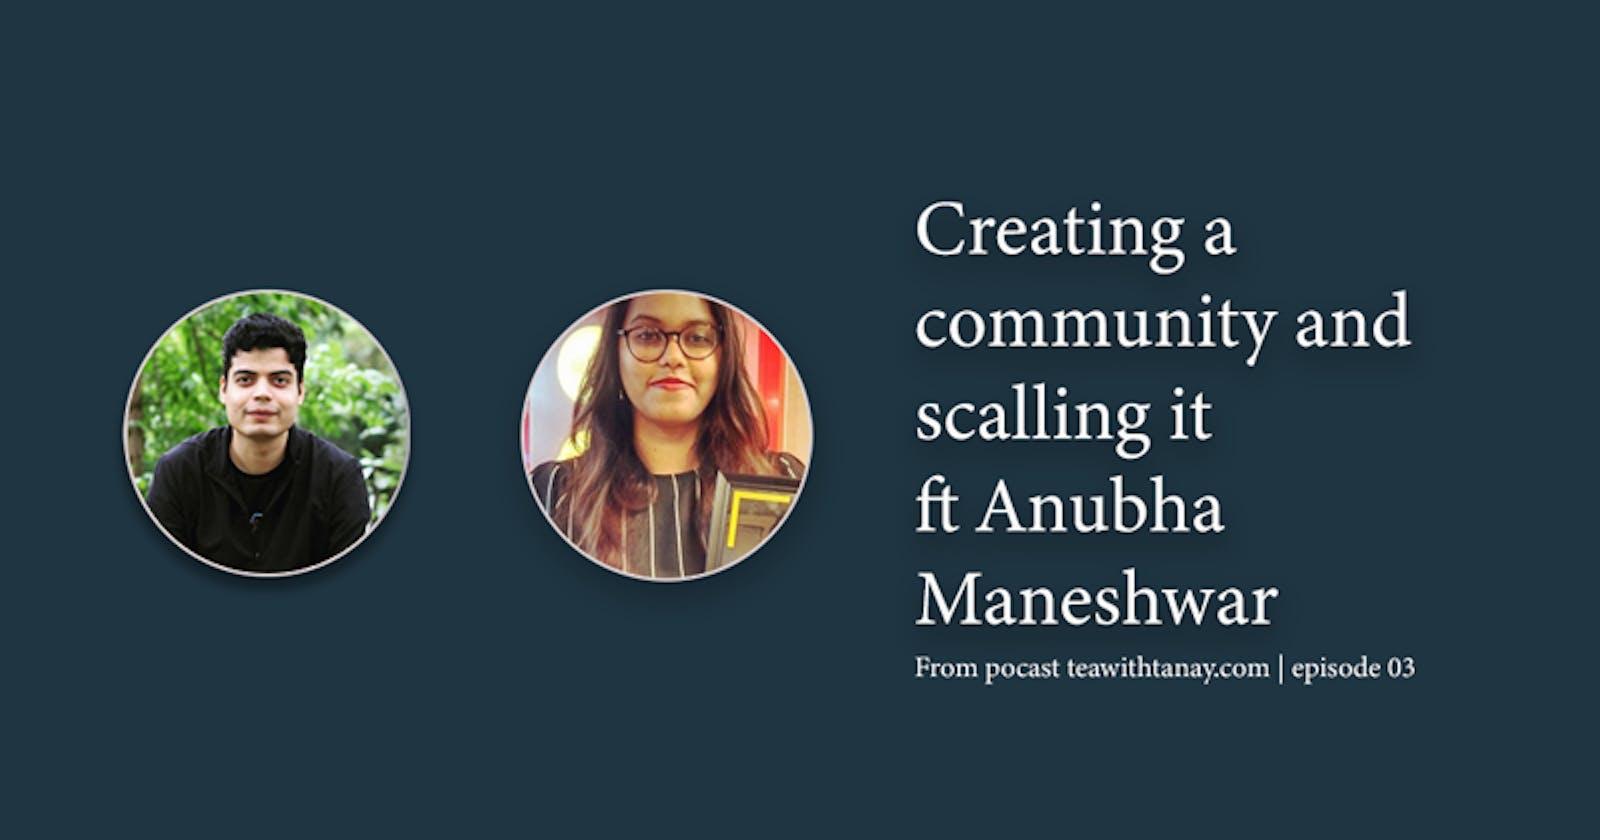 Creating community and scaling it too ft Anubha Maneshwar